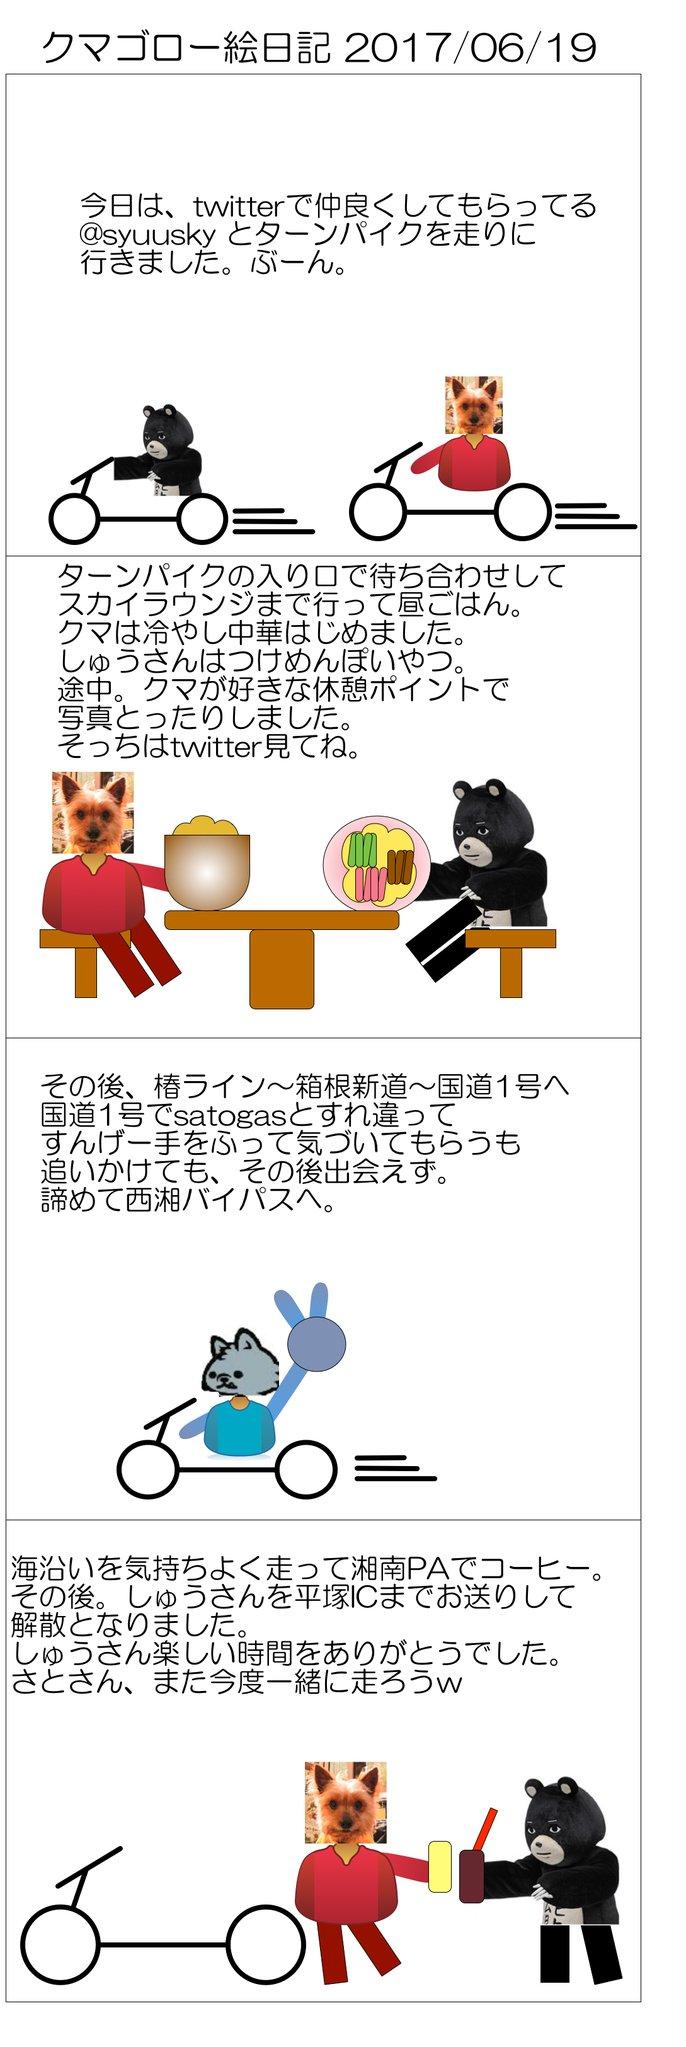 https://cdn-ak2.f.st-hatena.com/images/fotolife/k/kumagoro_bike/20170629/20170629063919_original.jpg